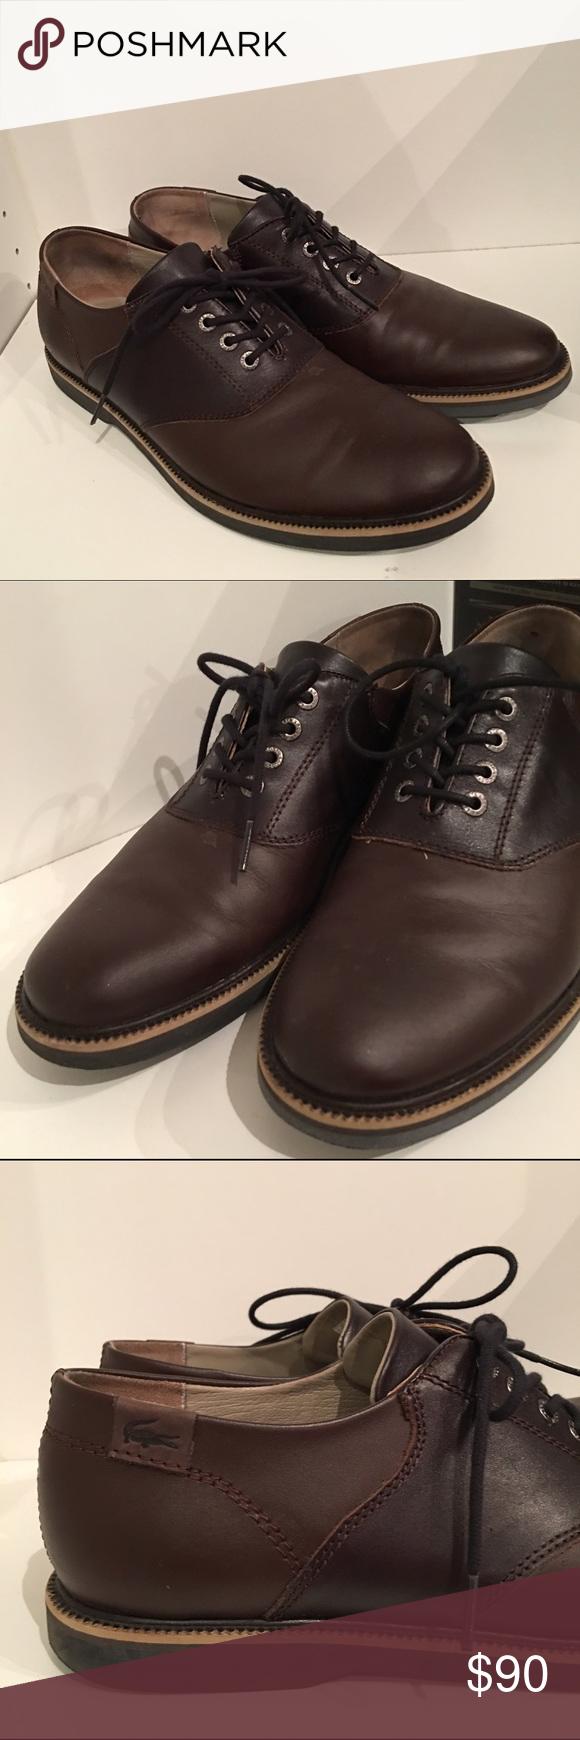 Formal shoes, Formal shoes for men, Shoes